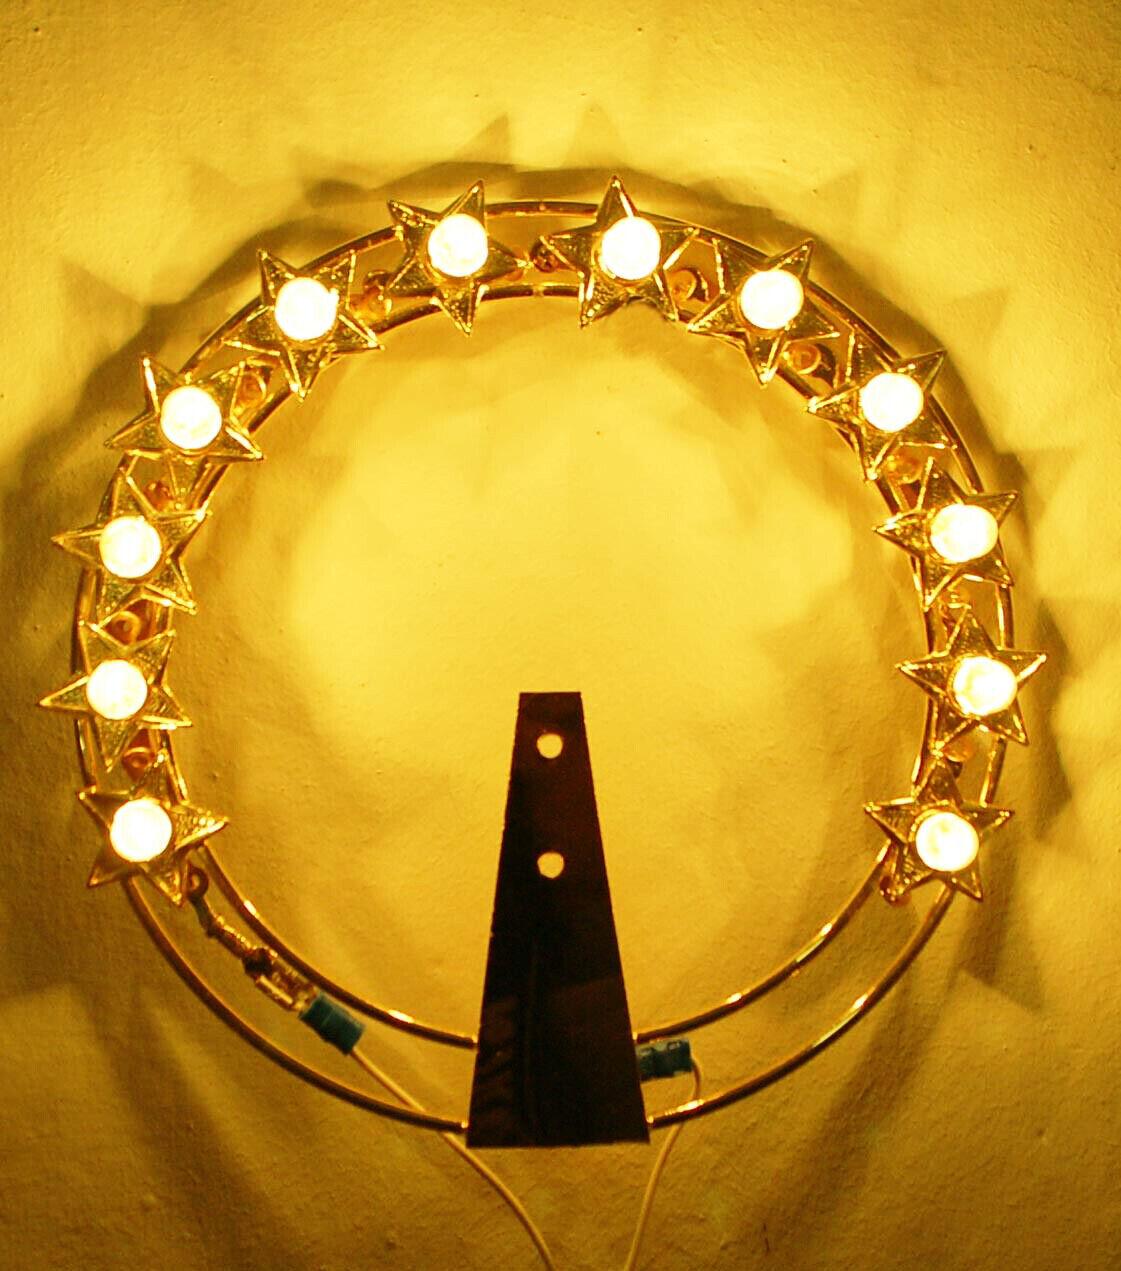 Luminous Votive coronet In Brass With Strass Stellario Aureole Several Measures